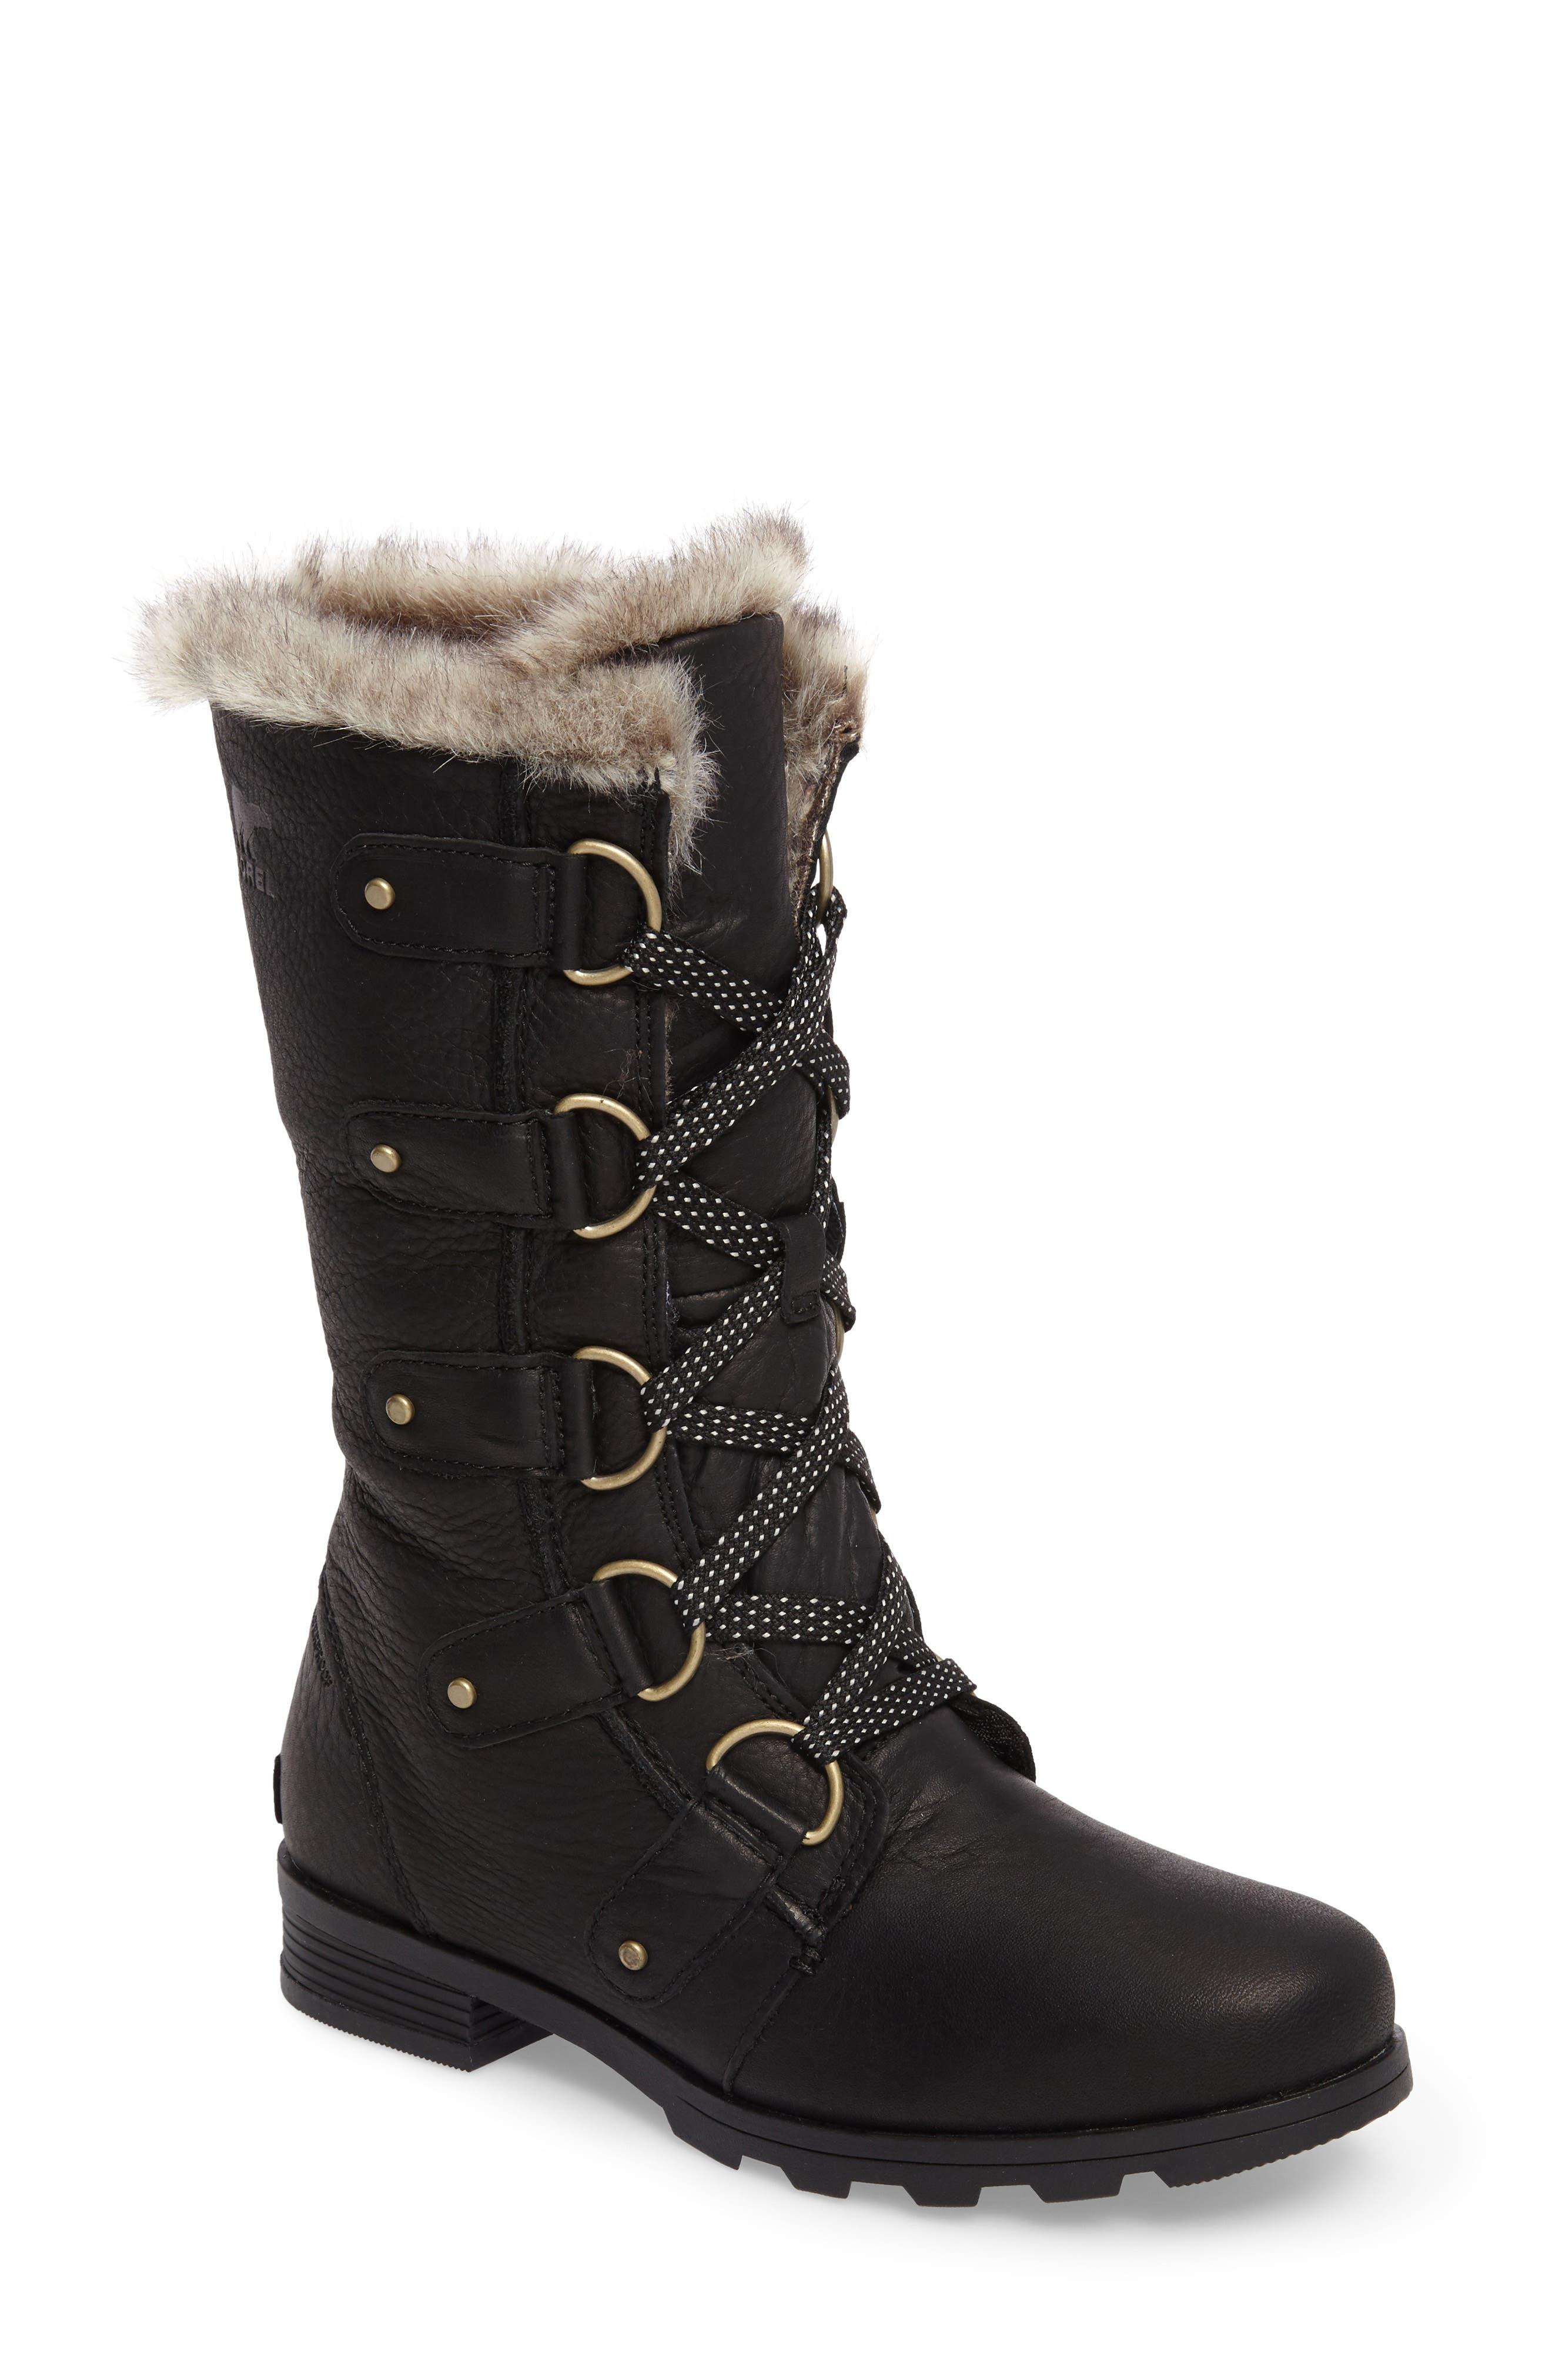 Emelie Waterproof Lace Up Boot with Faux Fur Trim,                         Main,                         color, Black